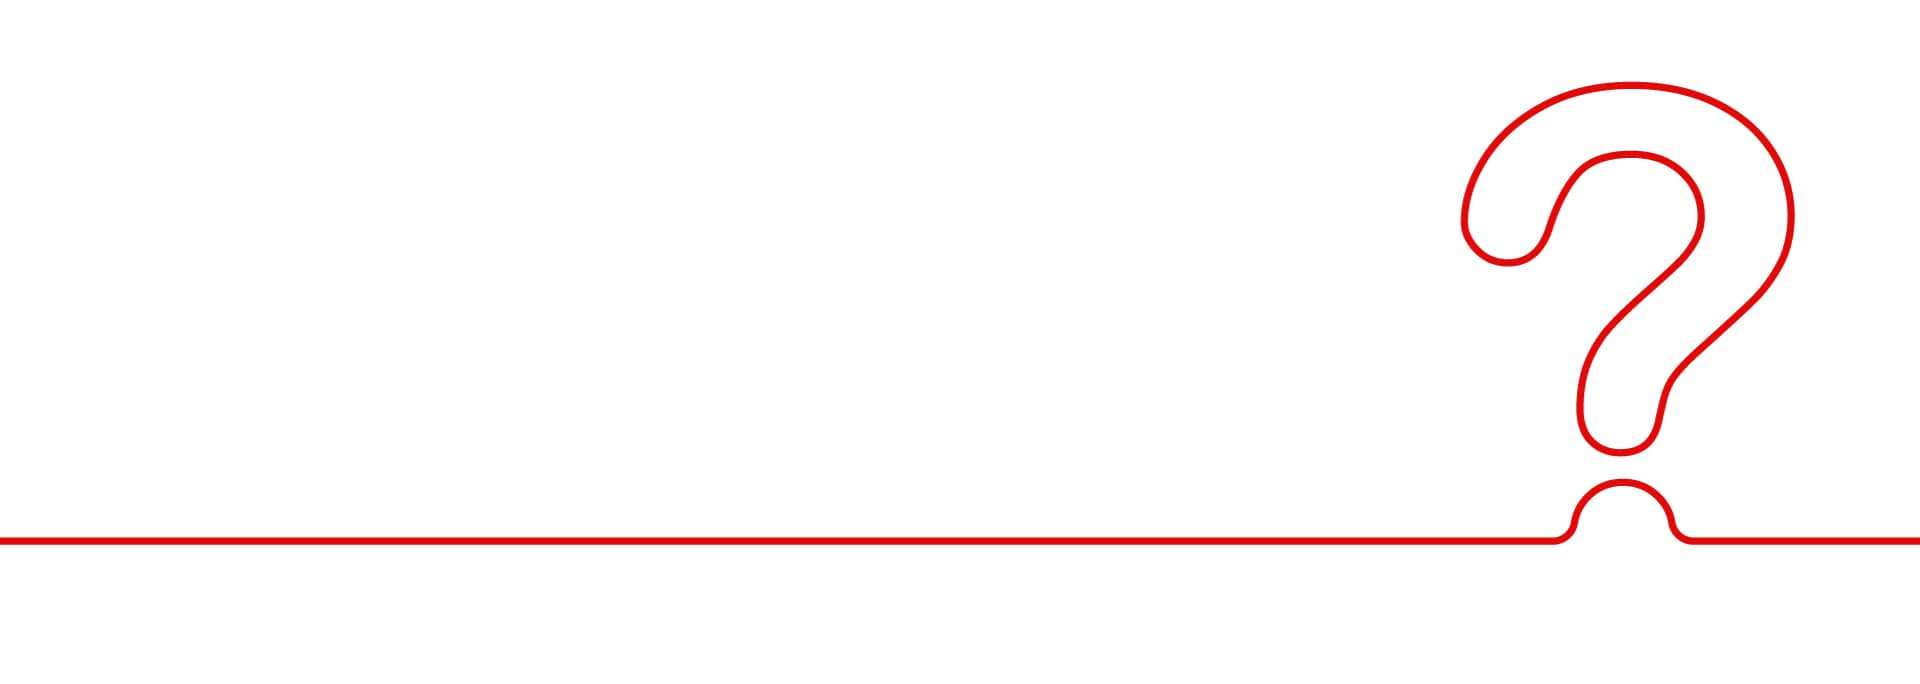 【SORENA】飲食店のメニューをQRコードからスマホに表示   お問い合わせ